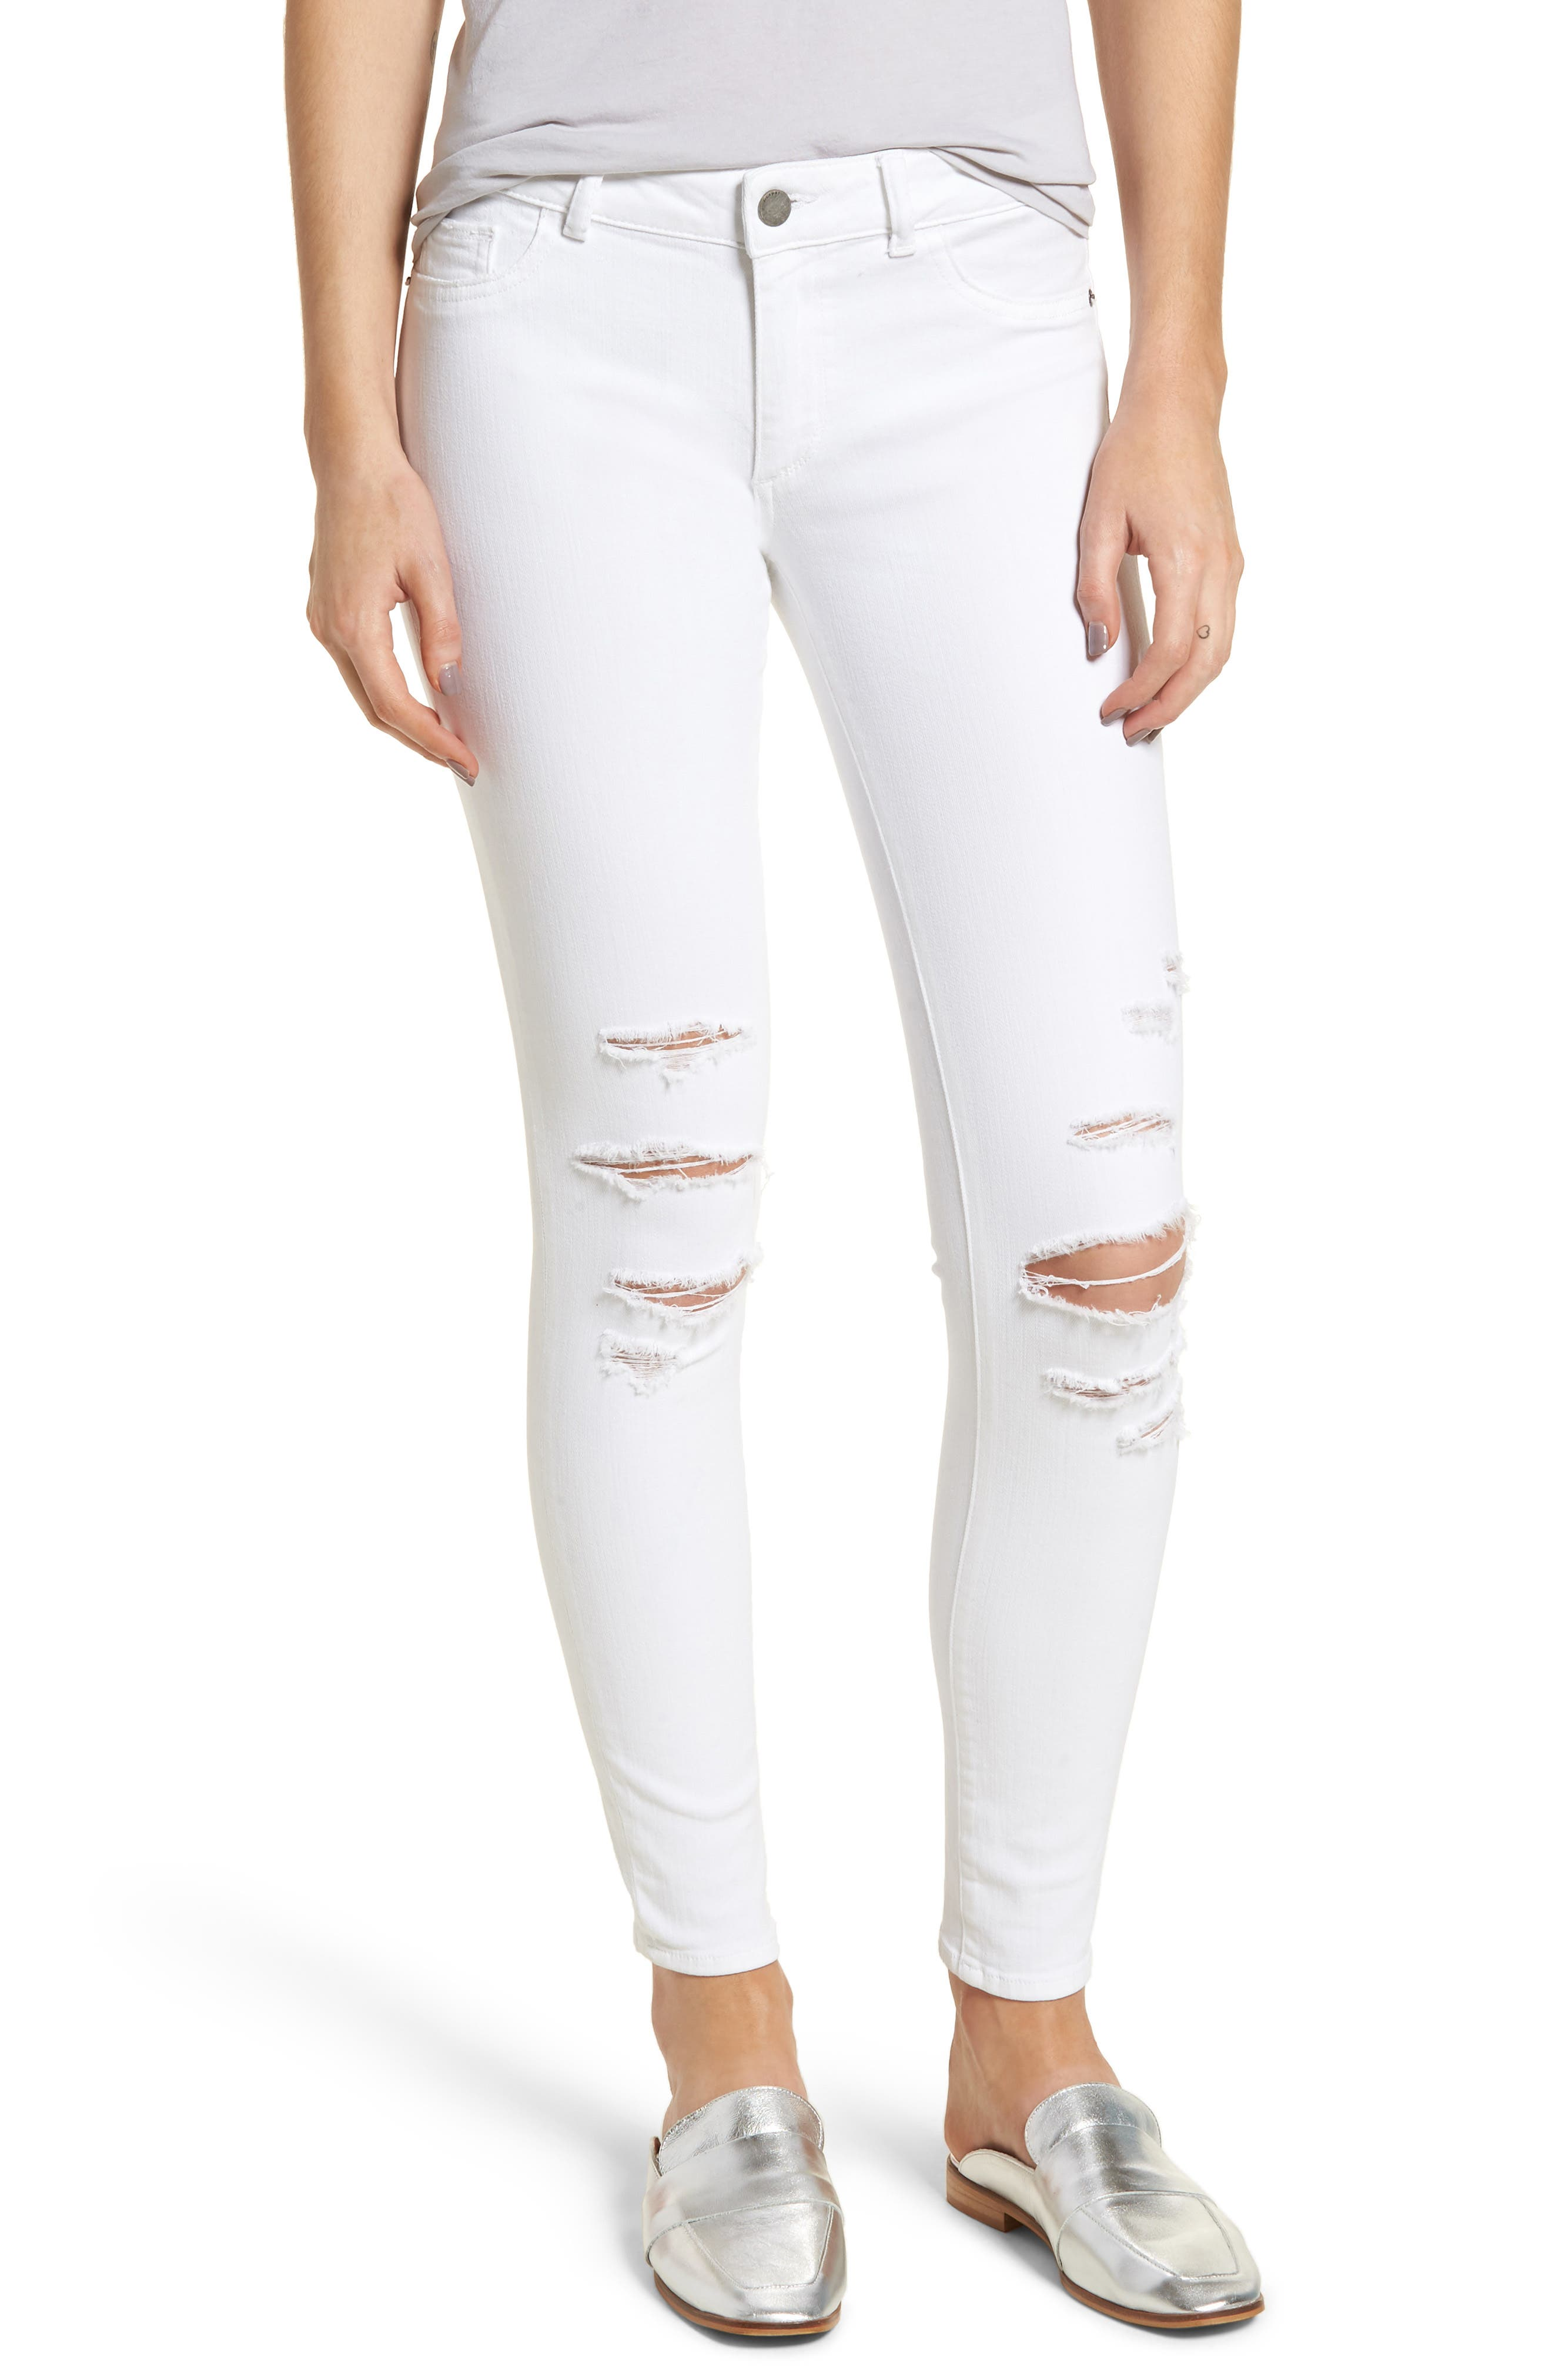 Emma Power Legging Jeans,                             Main thumbnail 1, color,                             Dawson